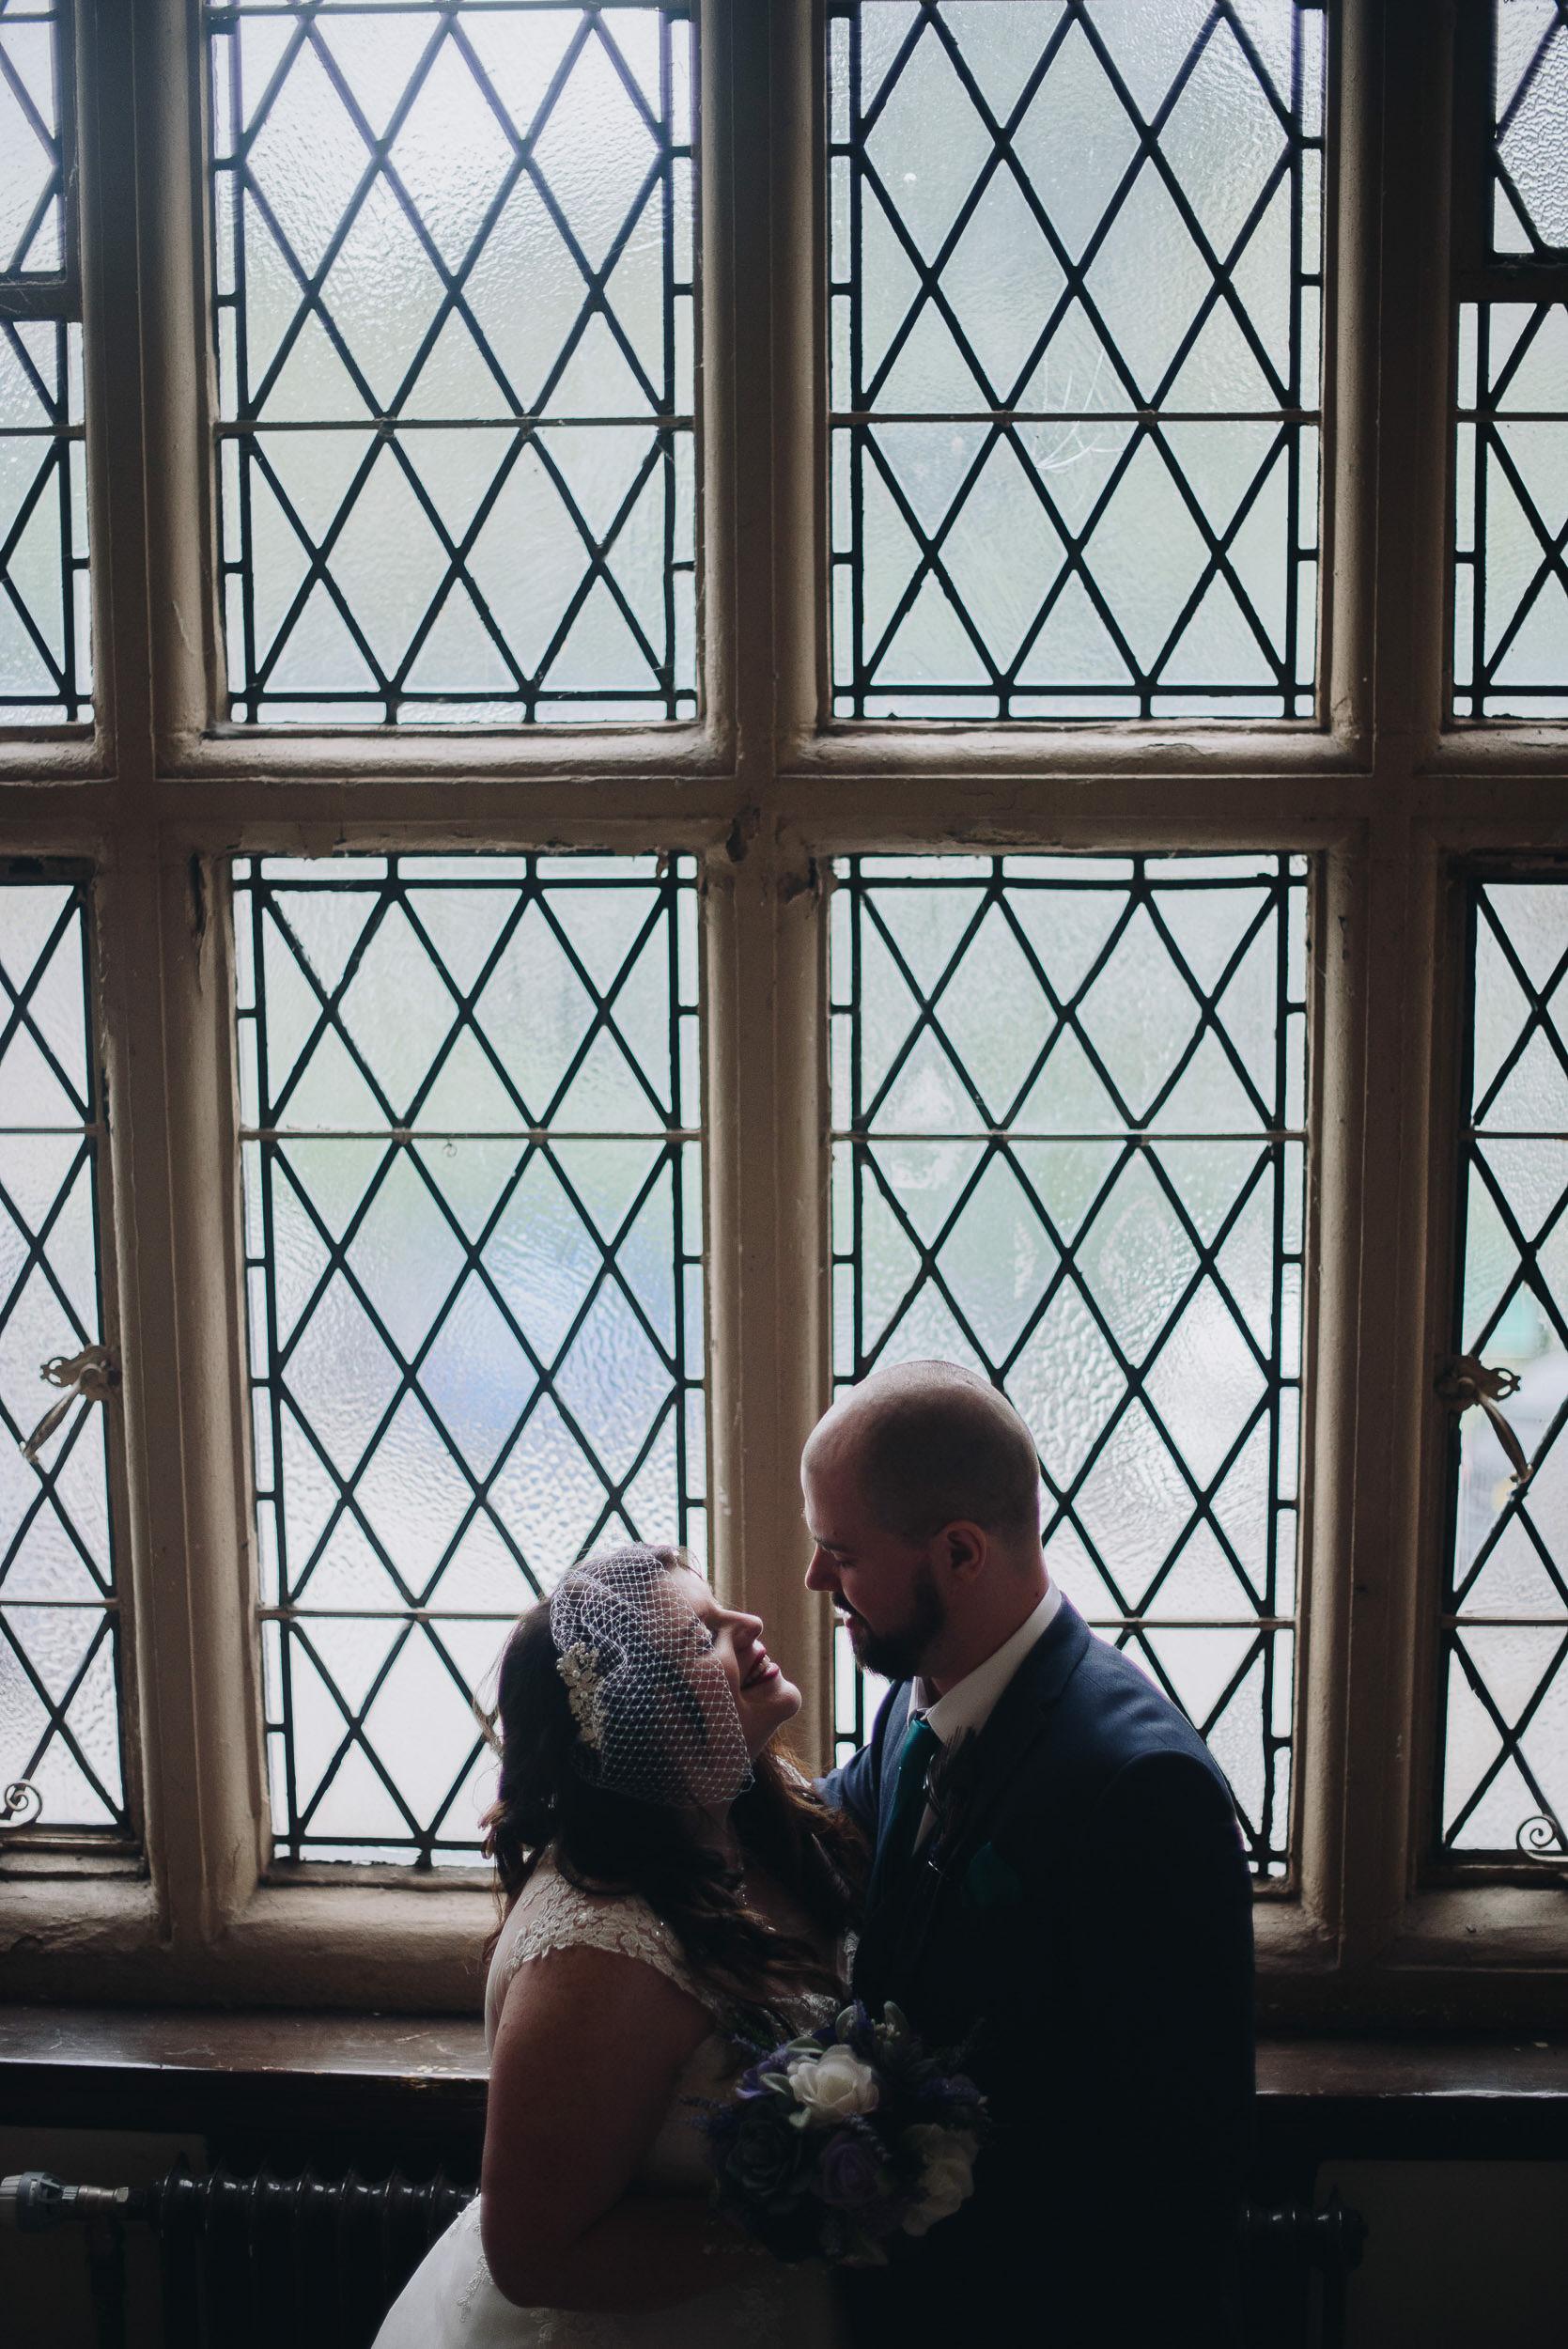 Smithills-hall-wedding-manchester-the-barlow-edgworth-hadfield-76.jpg